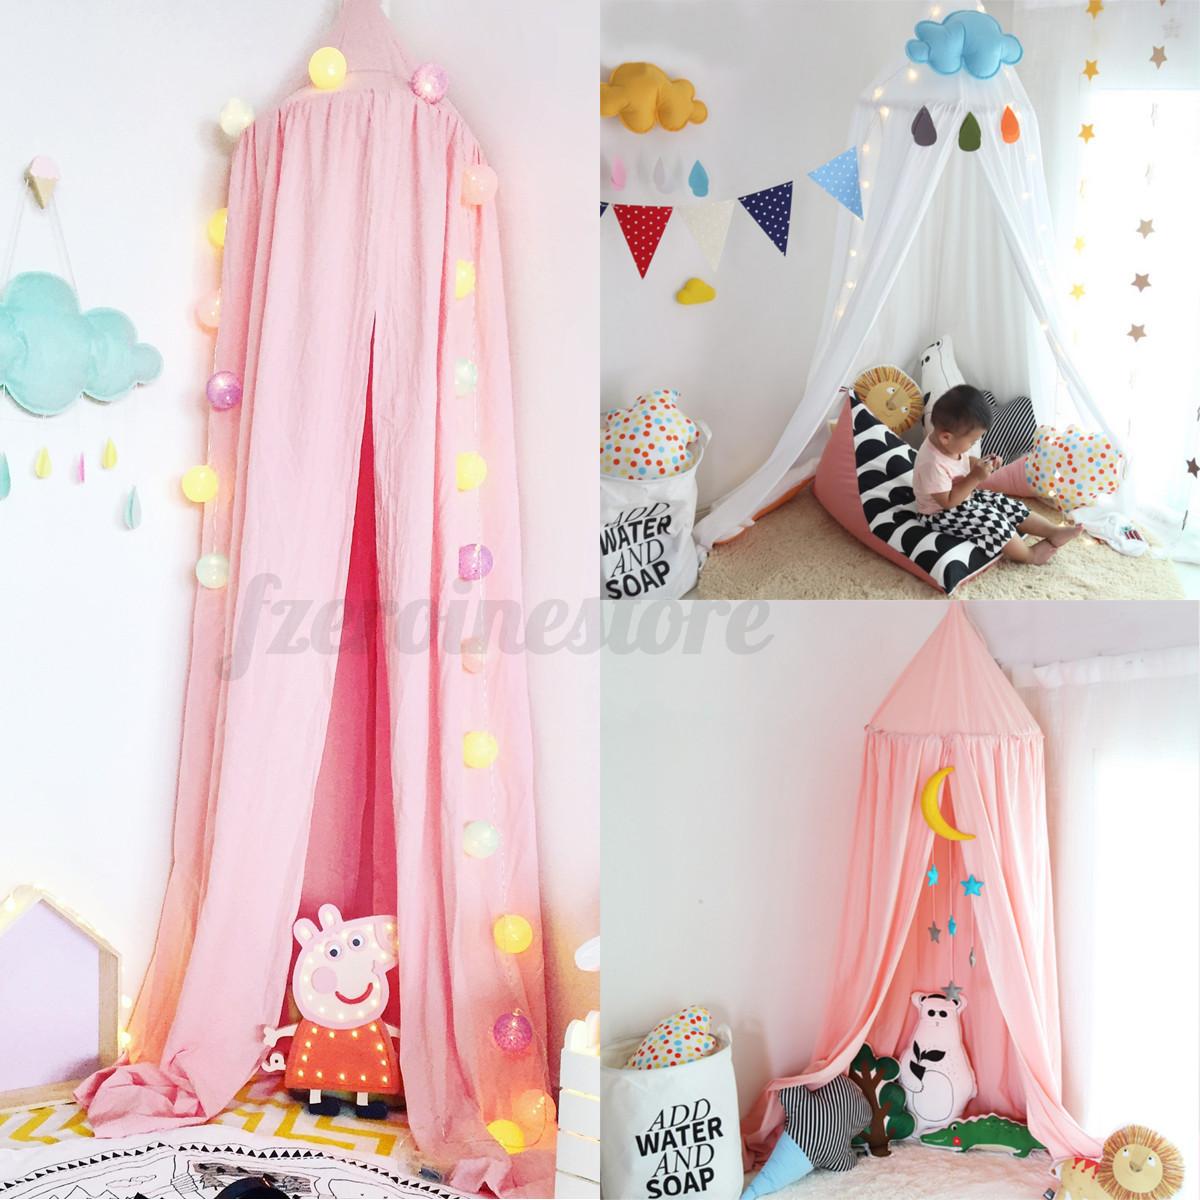 Redonda mosquitera dosel cortina curvado tienda cama cuna - Dosel cama nina ...